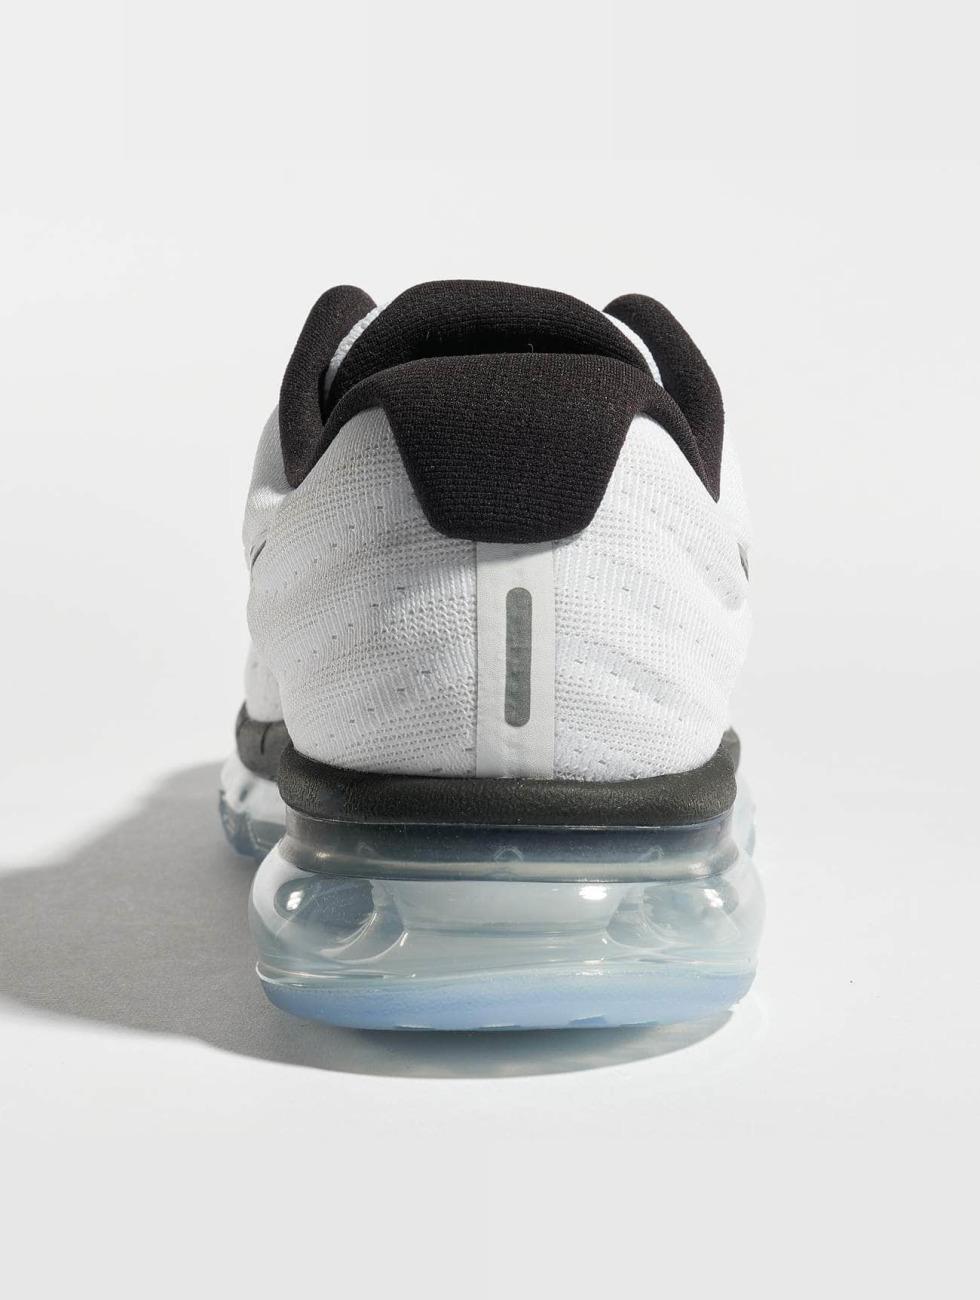 Nike Performance schoen / sneaker Air Max 2017 in wit 528817 Snel Express Outlet Nieuwste Collecties Beste Online Te Koop Outlet Footaction HcWvep